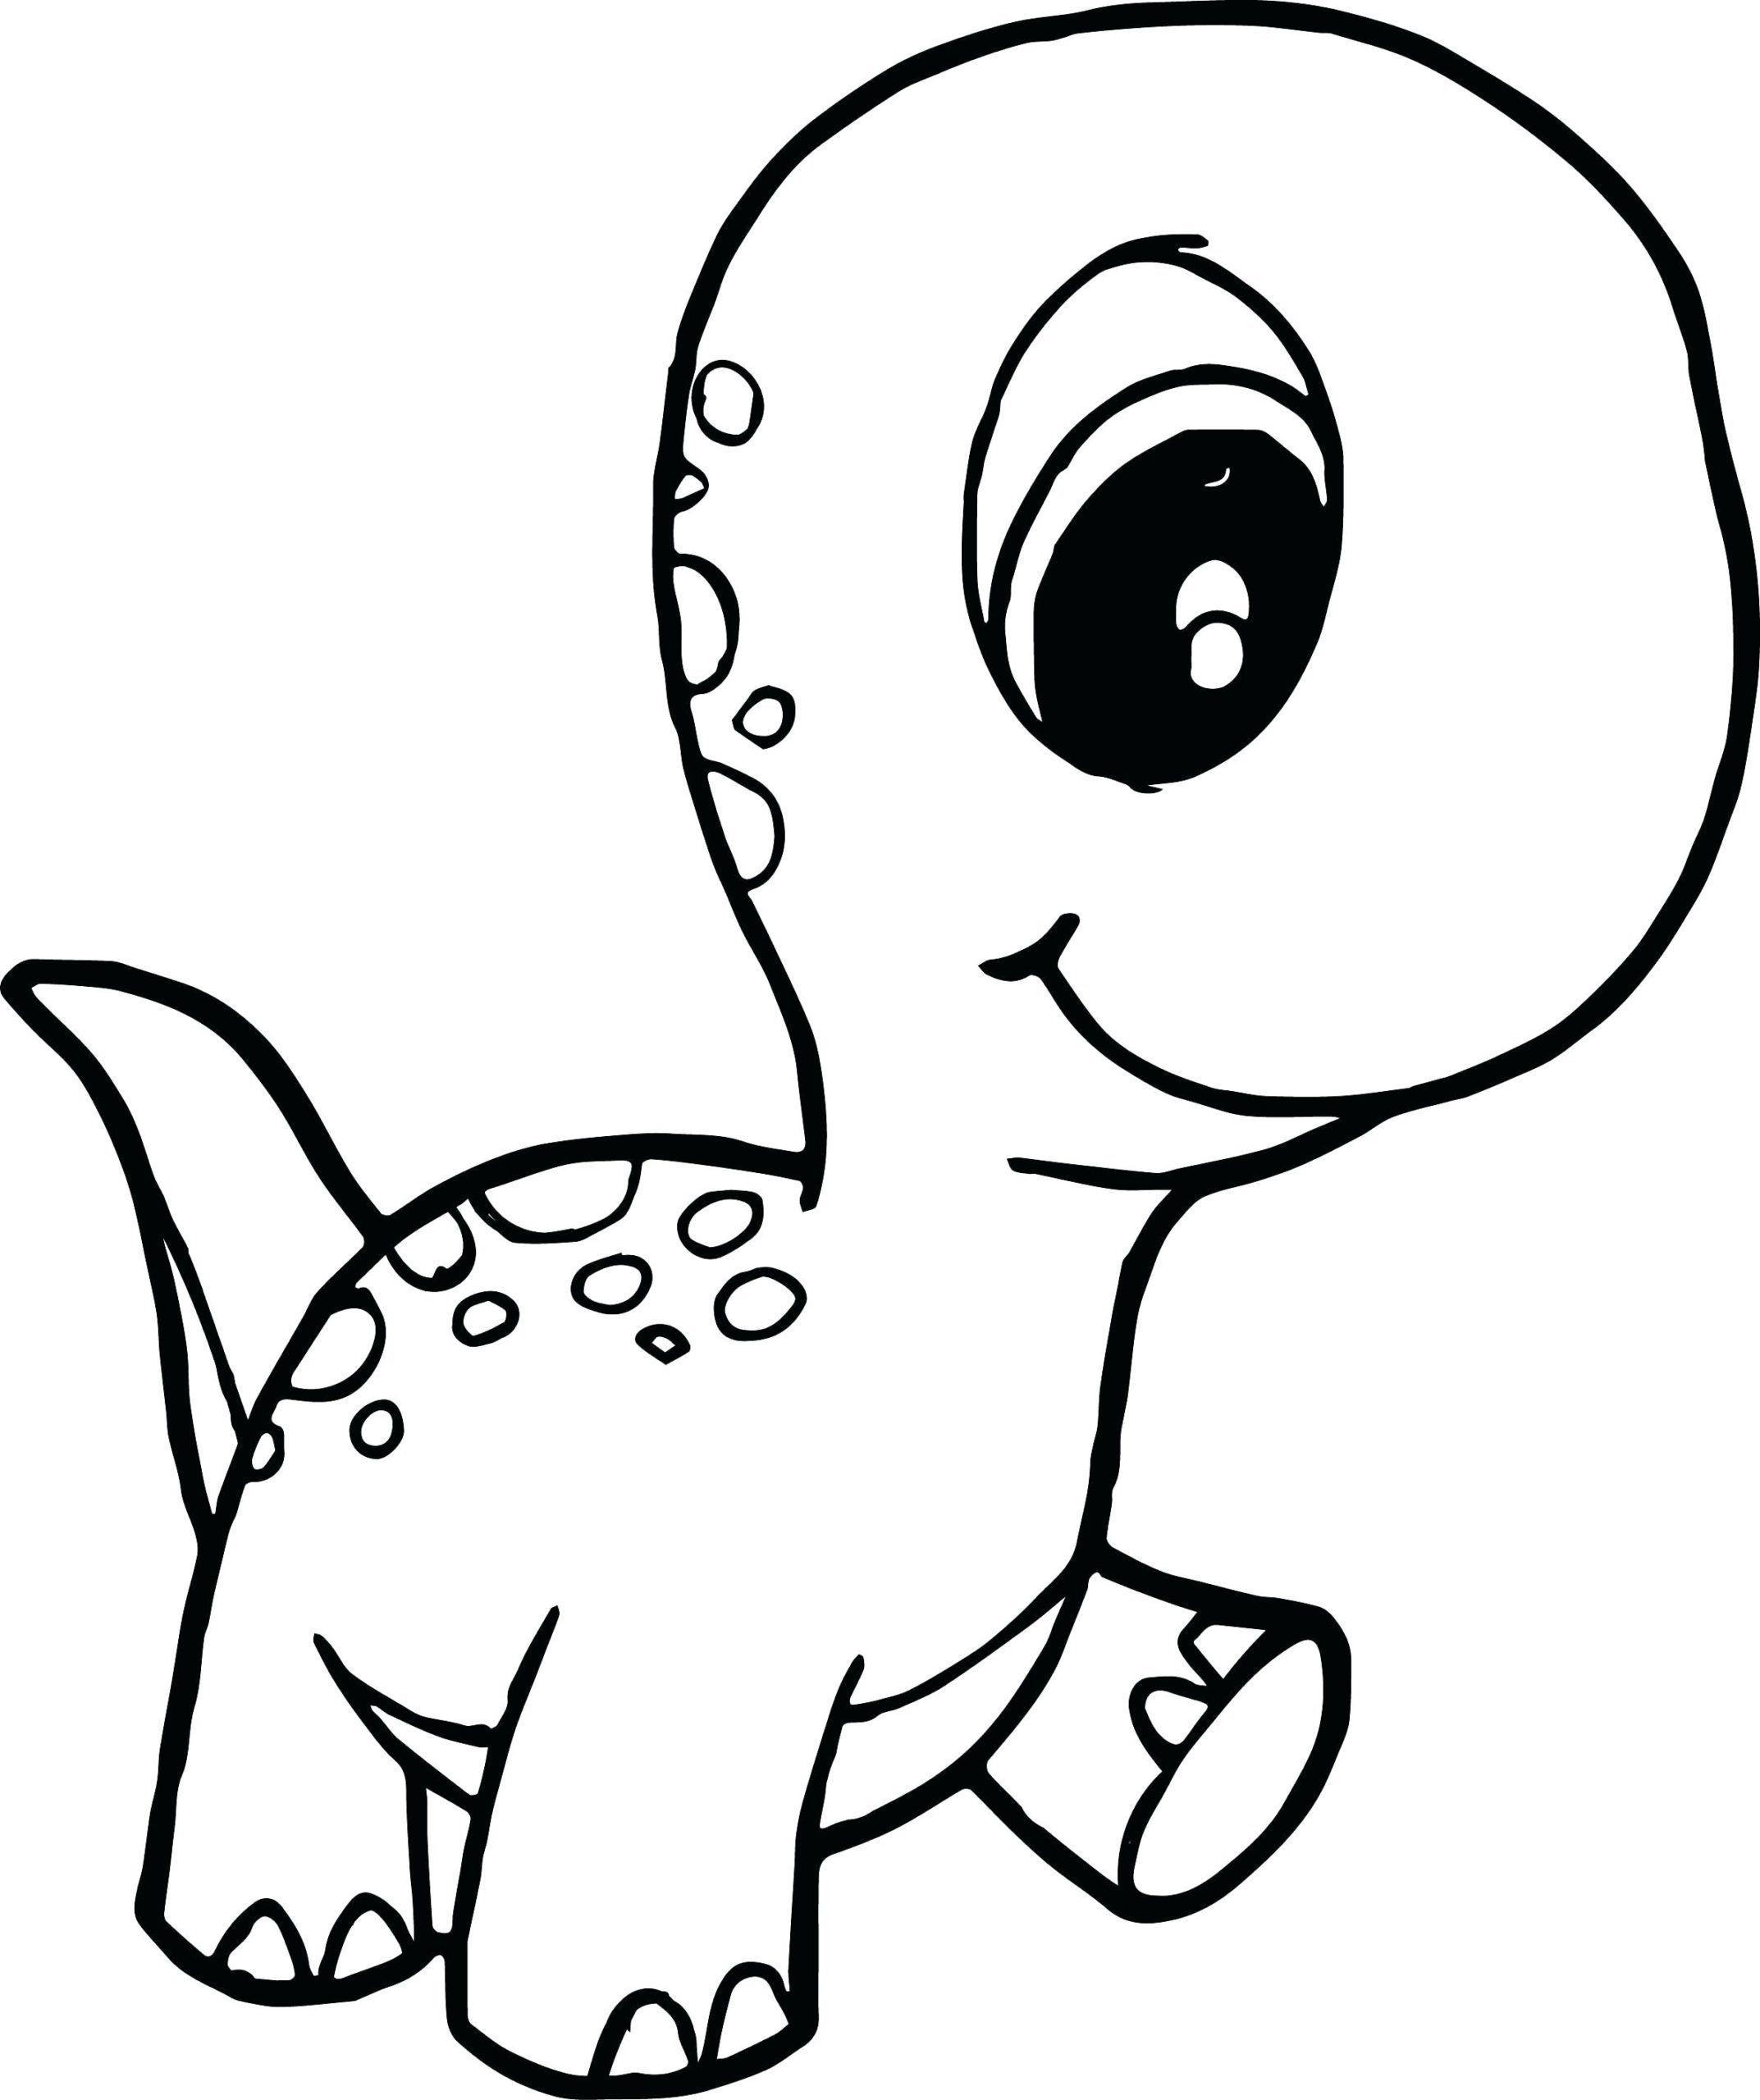 Cute Baby Animal Coloring Pages To Print Farm Sheets Little Printable Cartoon Colouring Free Zoo Animals Sea Lawn Mower Joseph Pumpkin Faces Di 2020 Warna Anak Gambar